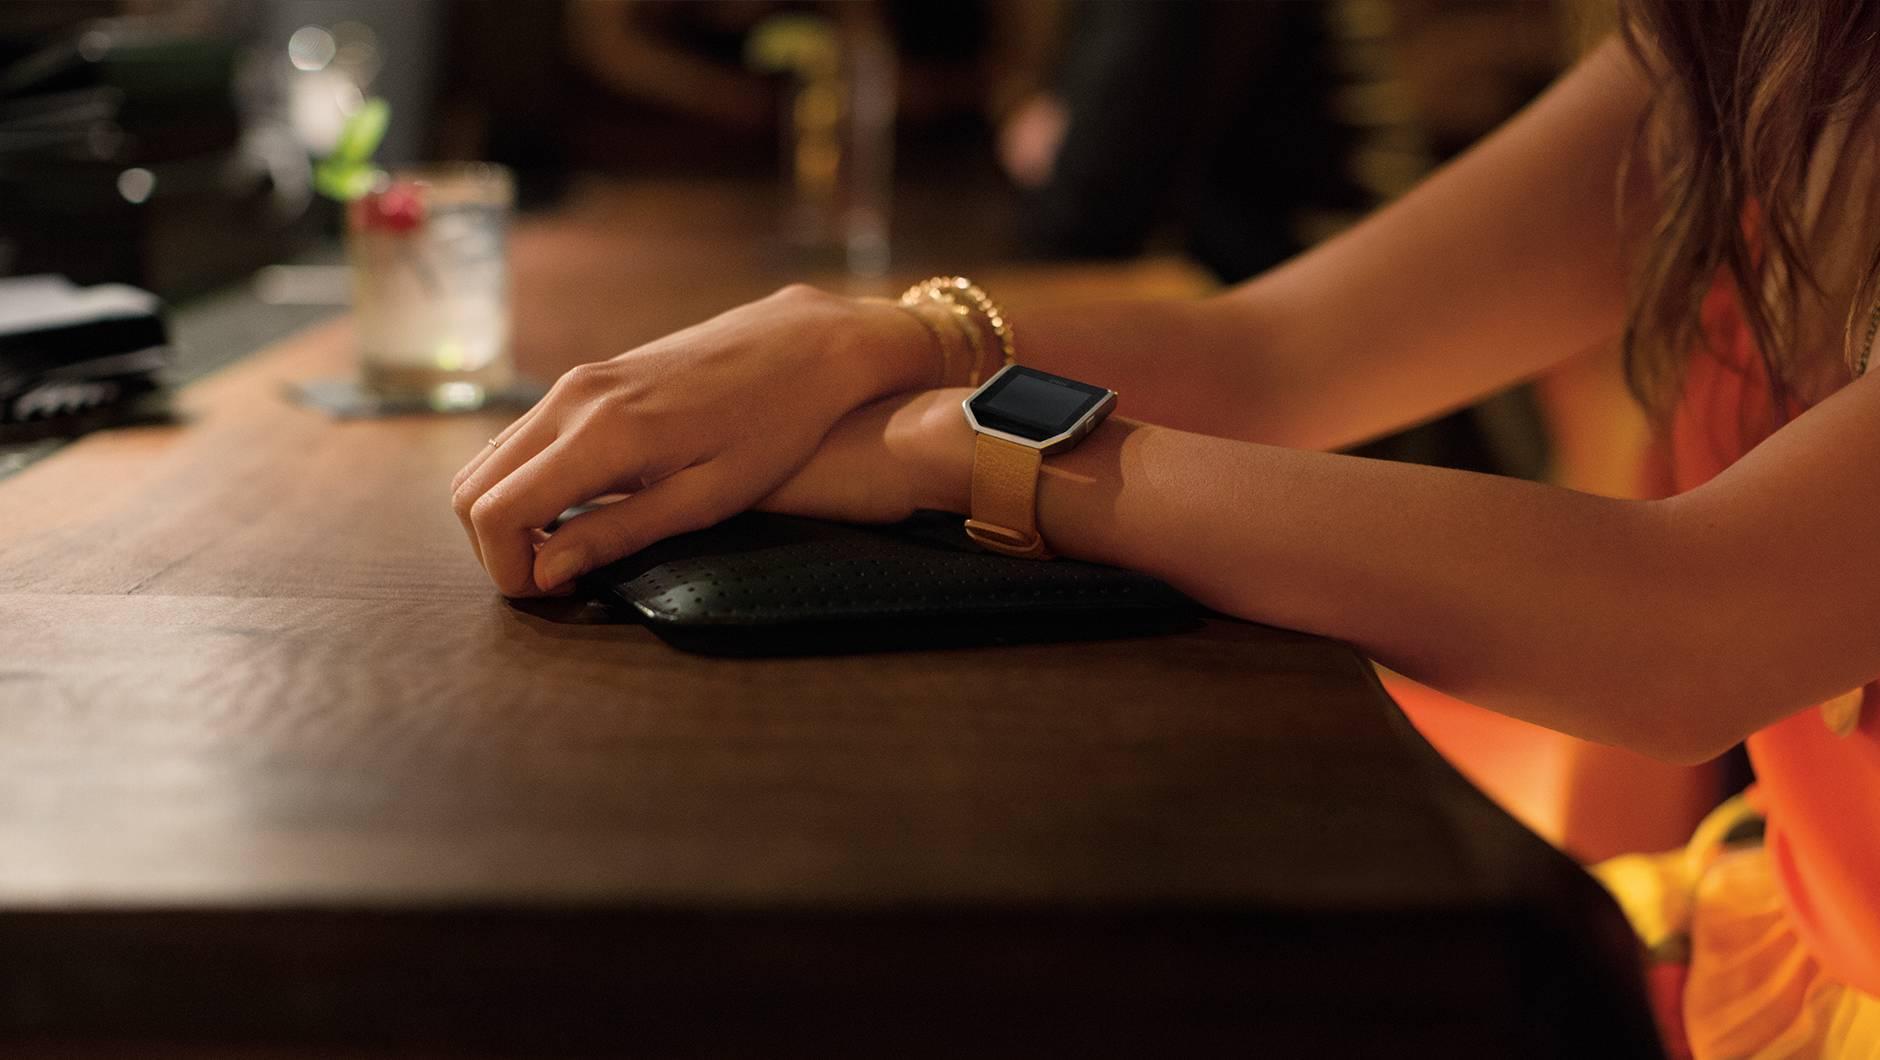 Review: Fitbit Blaze